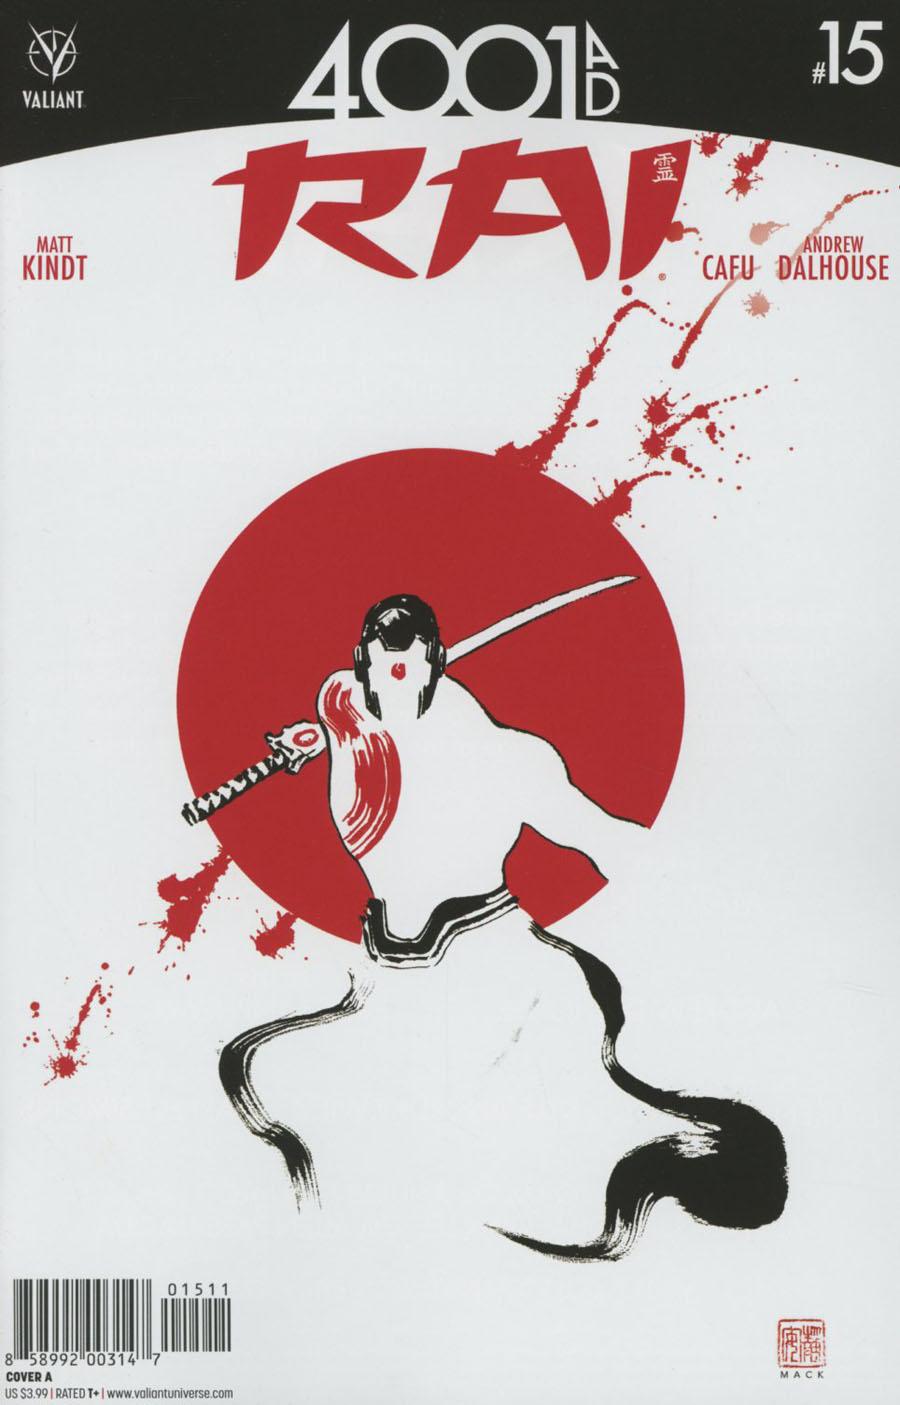 Rai Vol 2 #15 Cover A Regular David Mack Cover (4001 AD Tie-In)